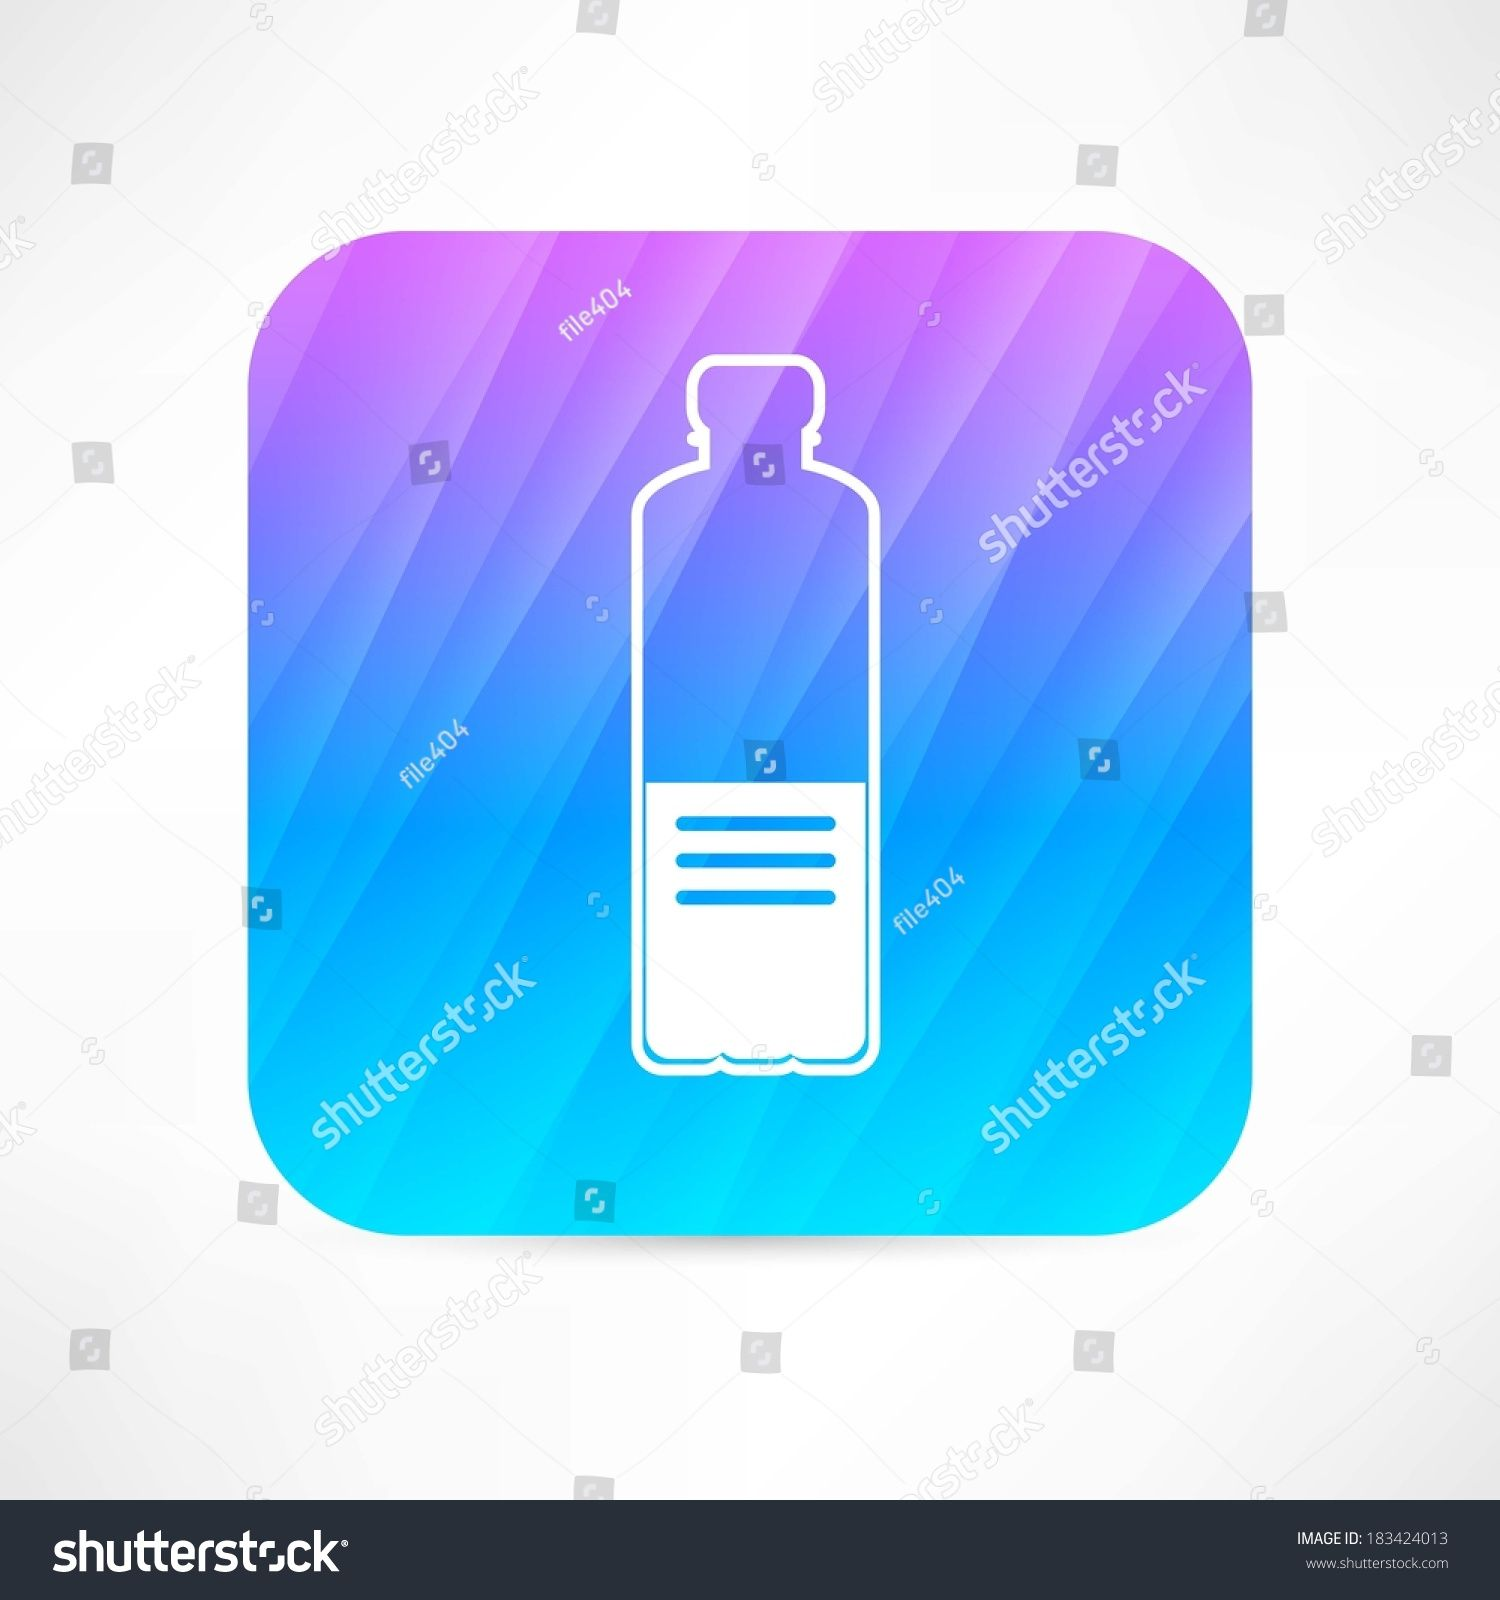 bottle icon Ad , AFFILIATE, bottleicon in 2020